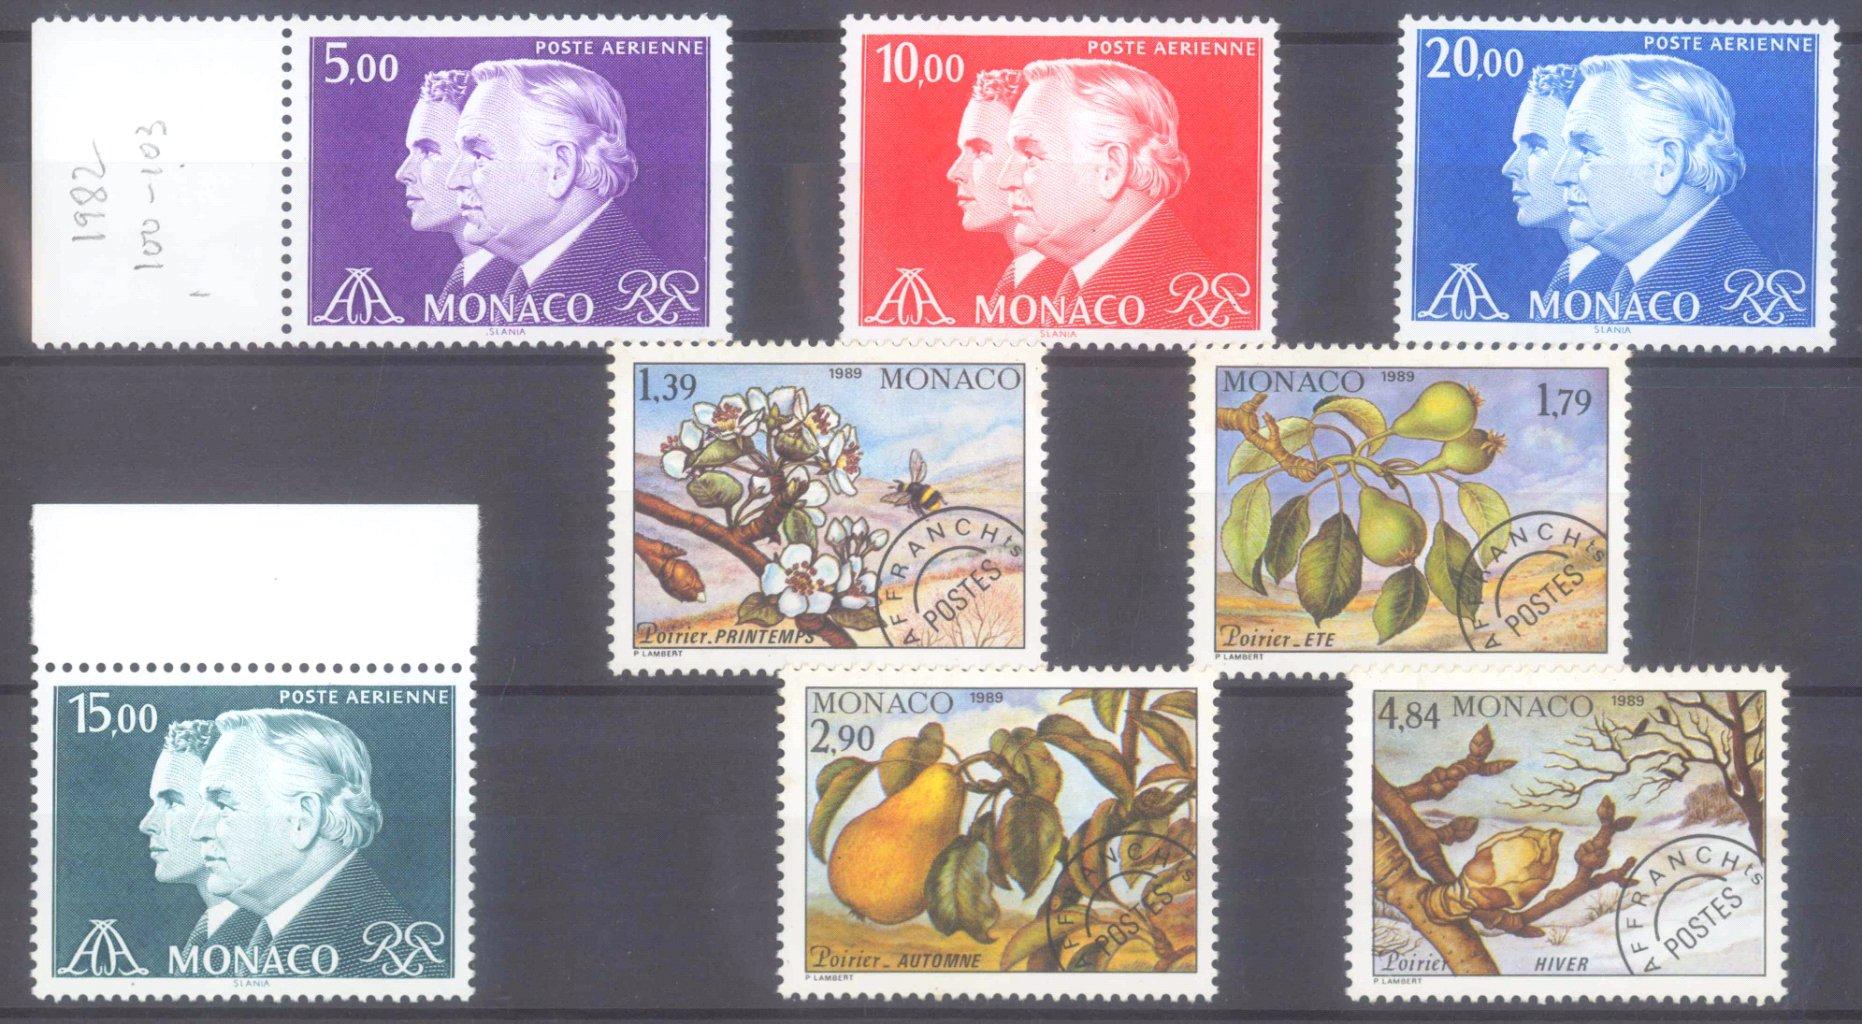 MONACO 1953-1989, Katalogwert 970,- Euro-12